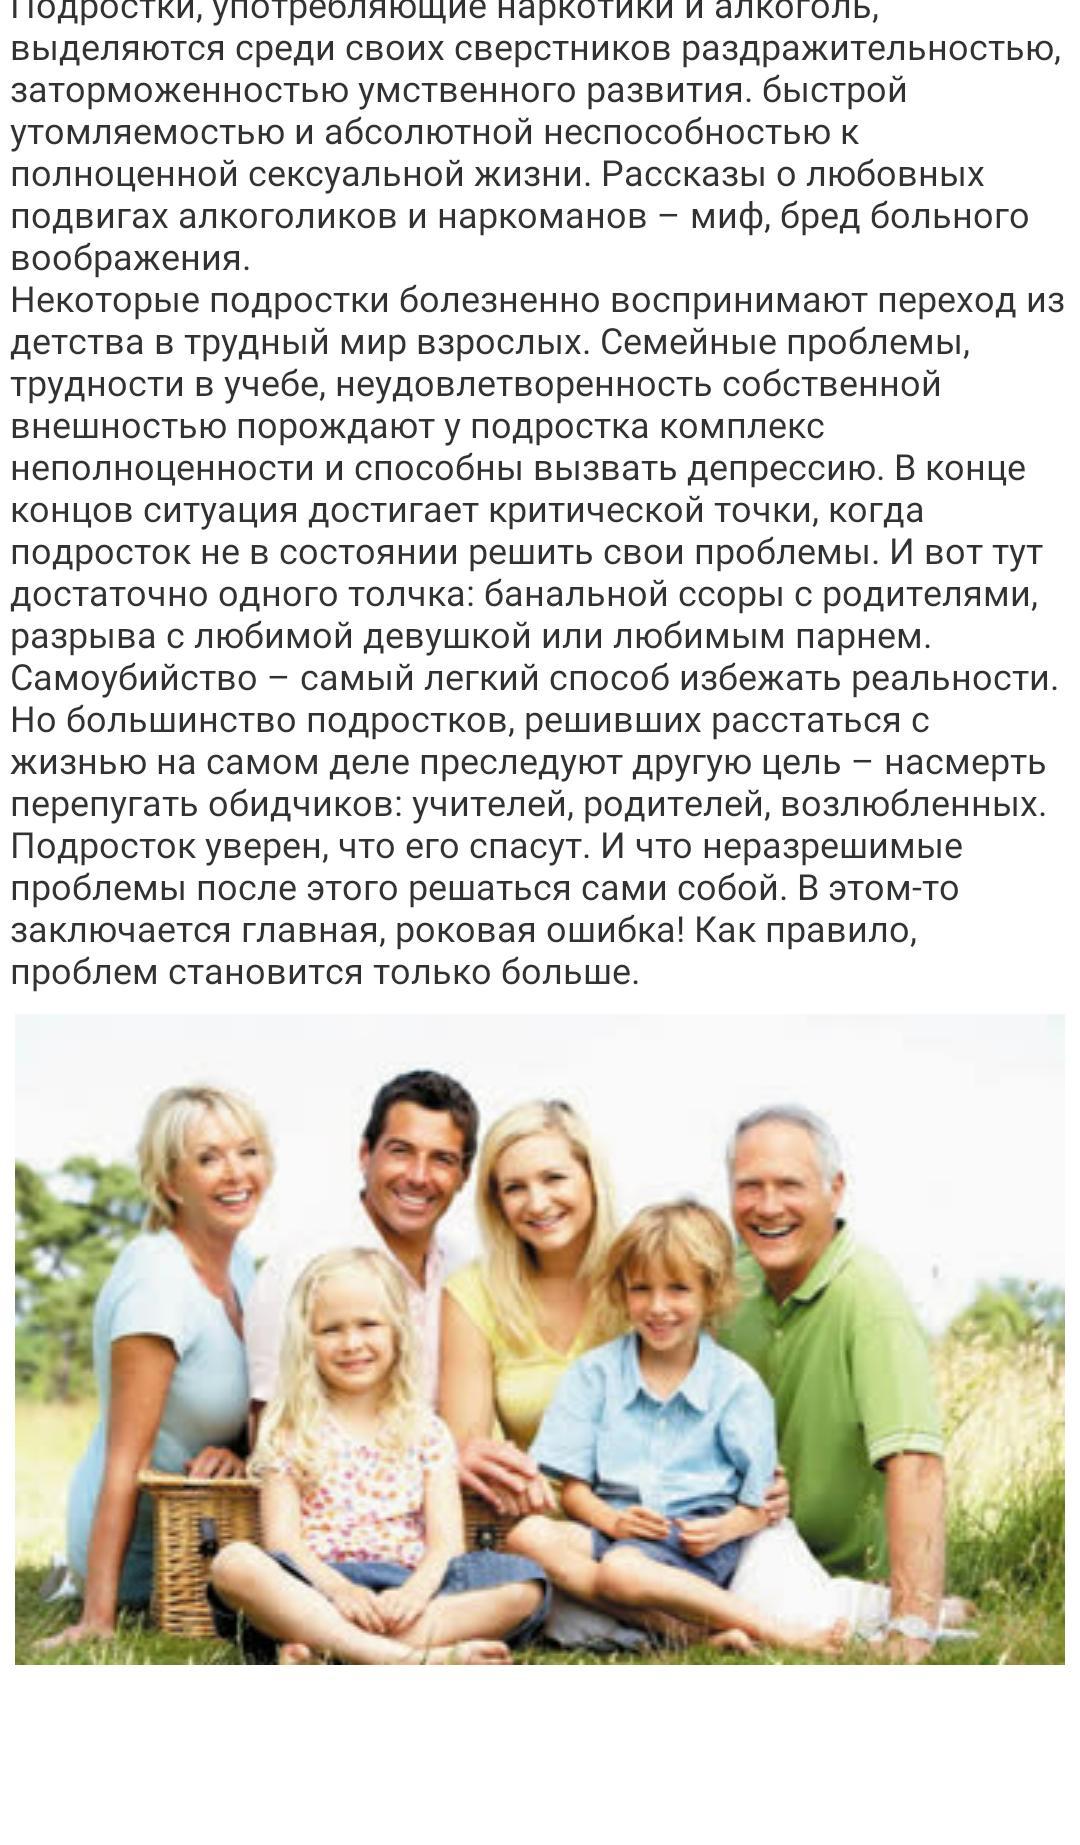 Крепкая и дружная семья Советы poster